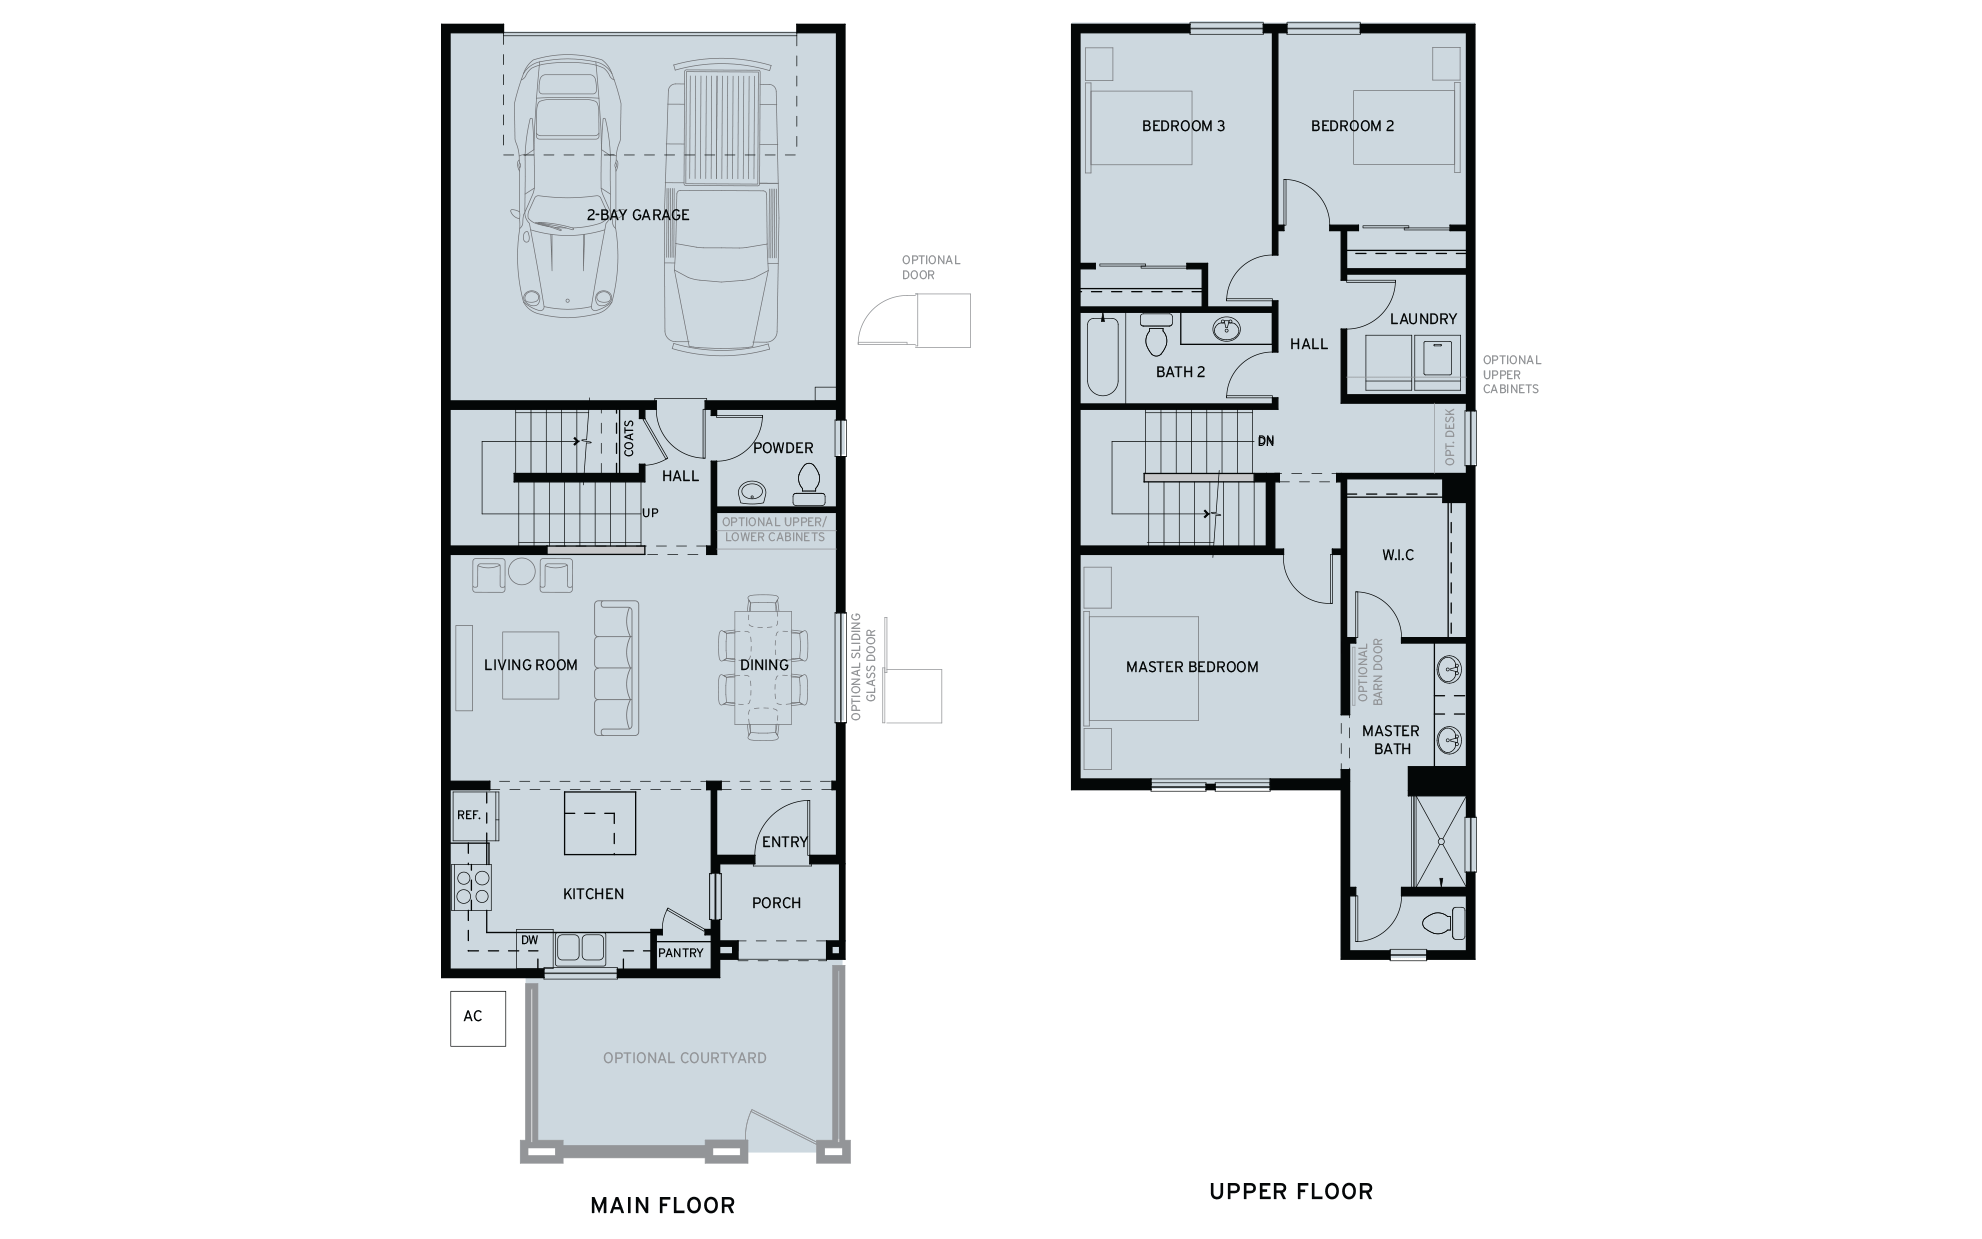 New Home Floorplans | New Home Floorplans New Homes Sacramento Ca Riverchase